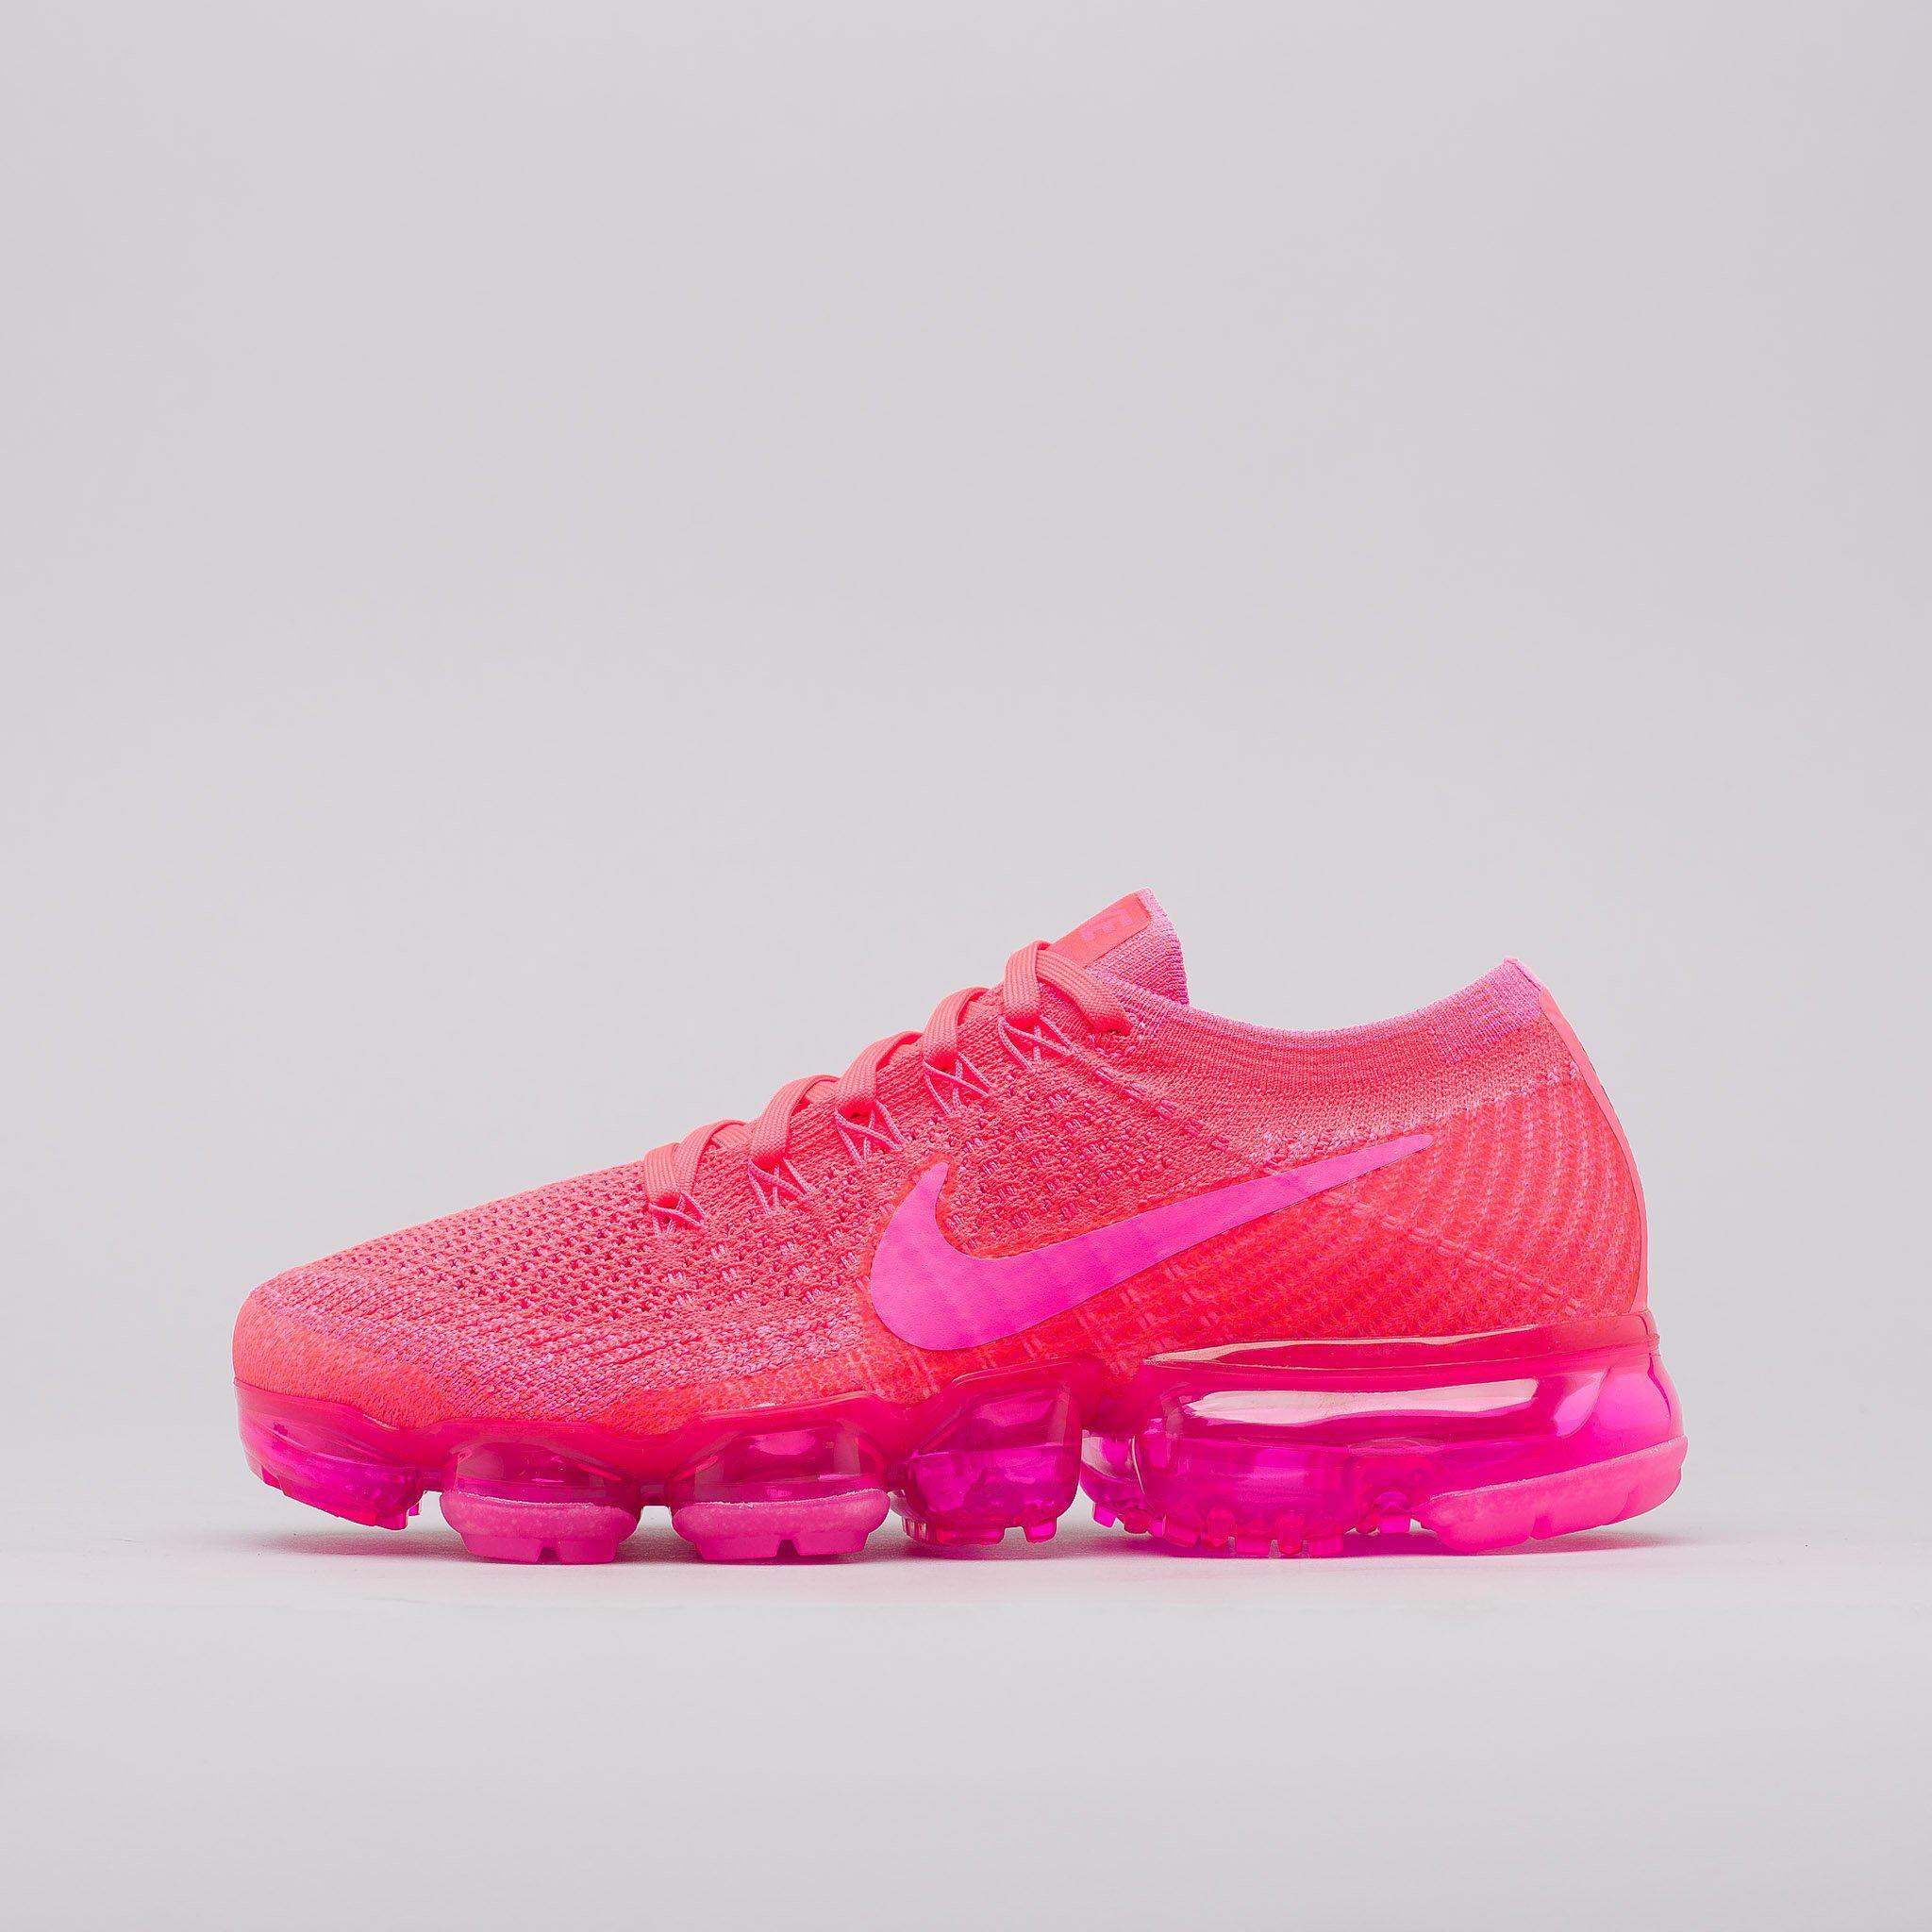 181c6cc8f6c ... Lyst - Nike Women s Air Vapormax Flyknit In Hyper Punch in Pink for  Men  Nike WMNS ...